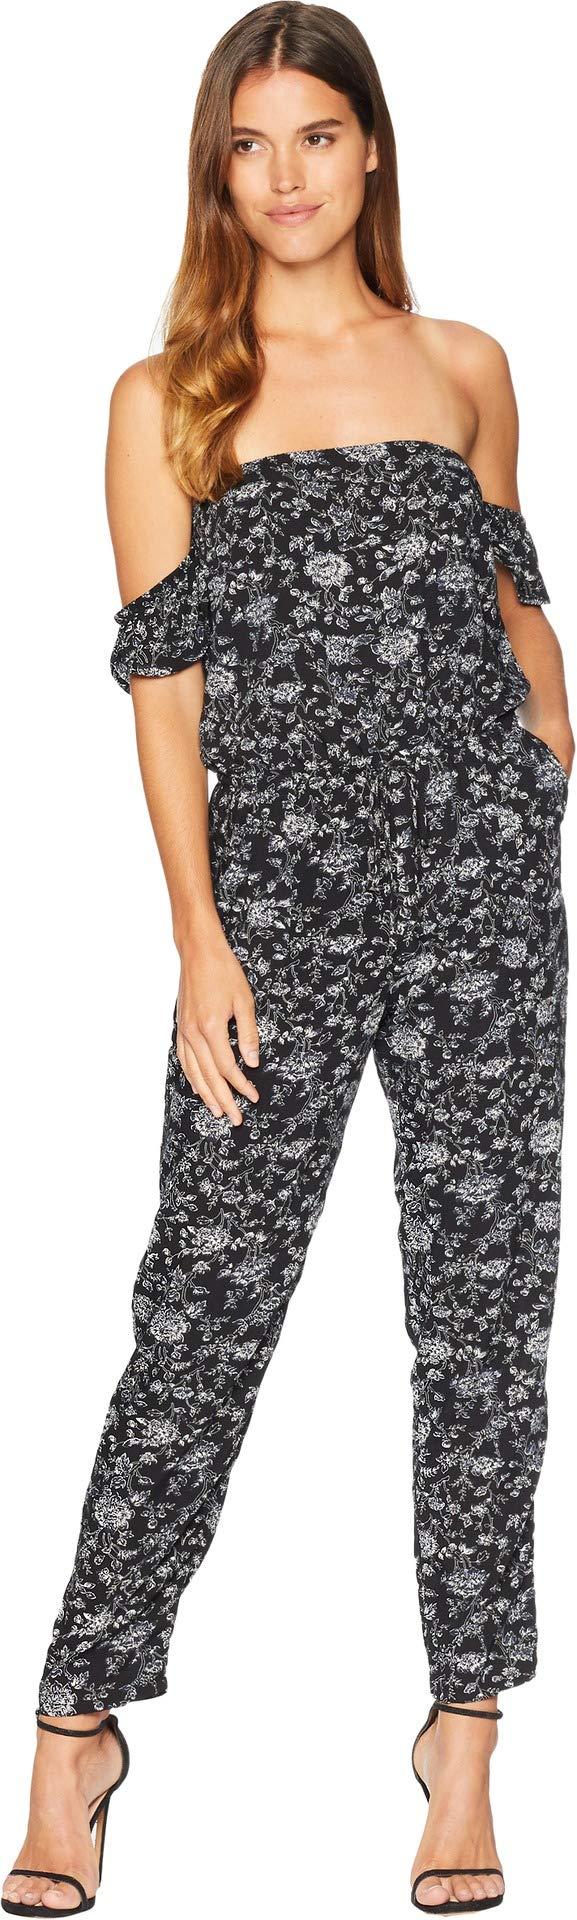 Lucy Love Women's Malibu Ranch Jumpsuit Mulberry Medium